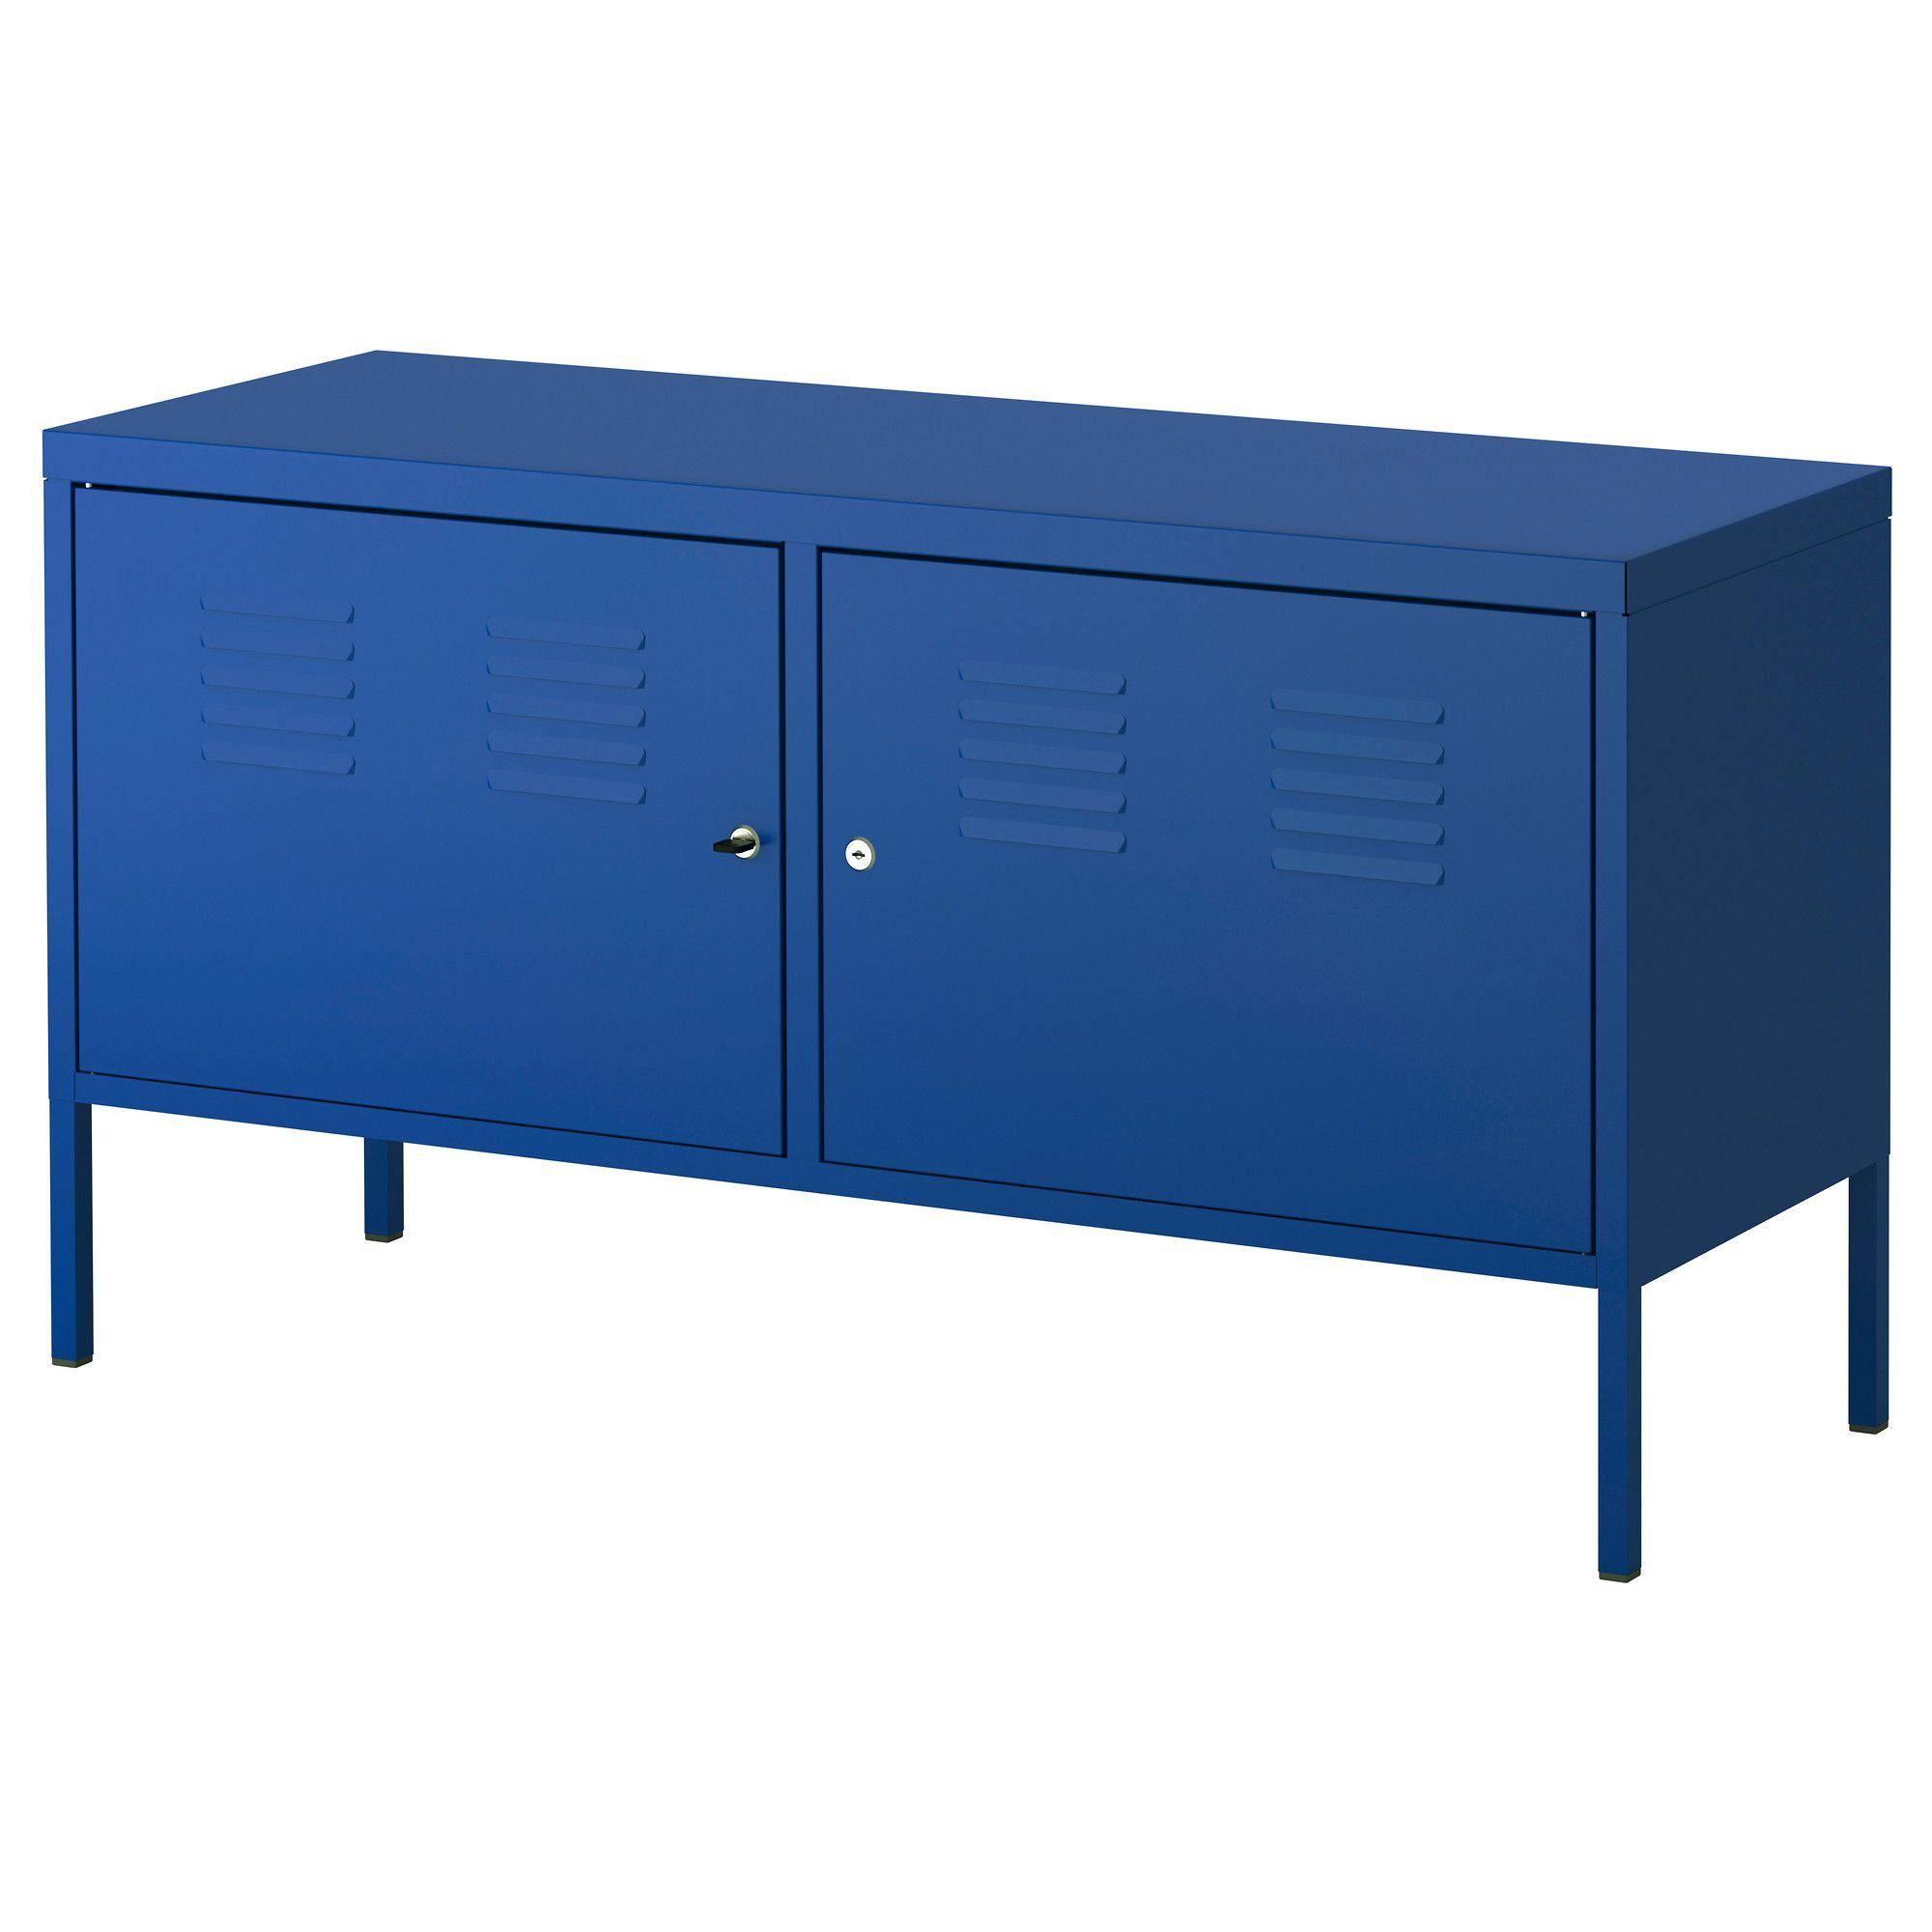 ikea ps schrank, blau | home sweet home | pinterest | ikea ps